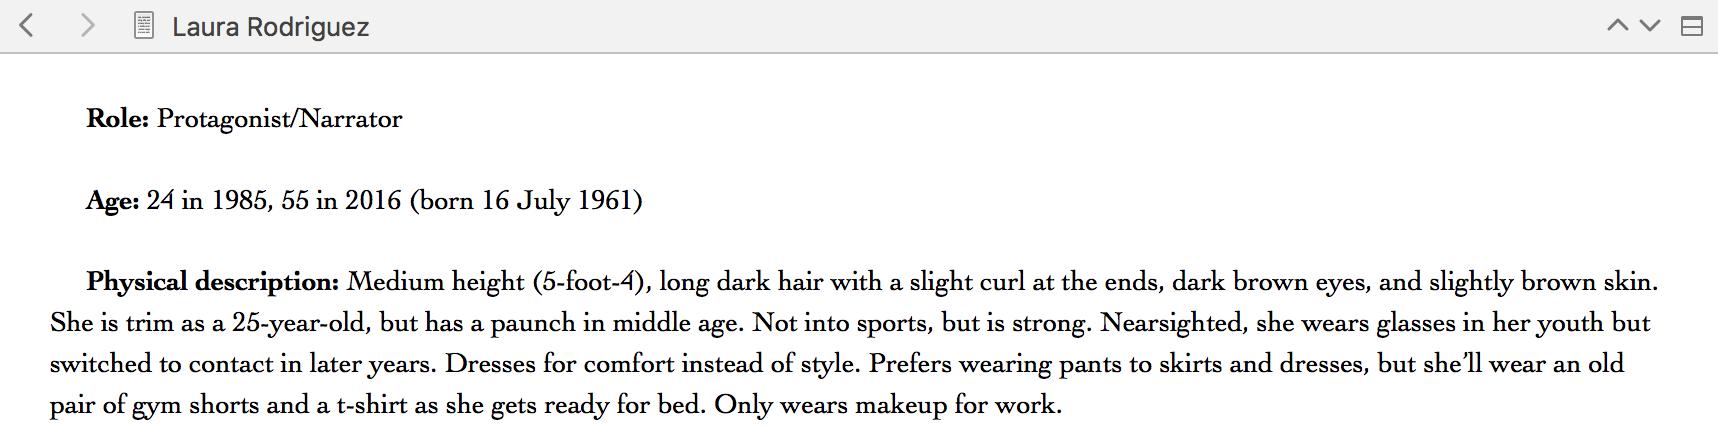 Sample of a character description in Scrivener